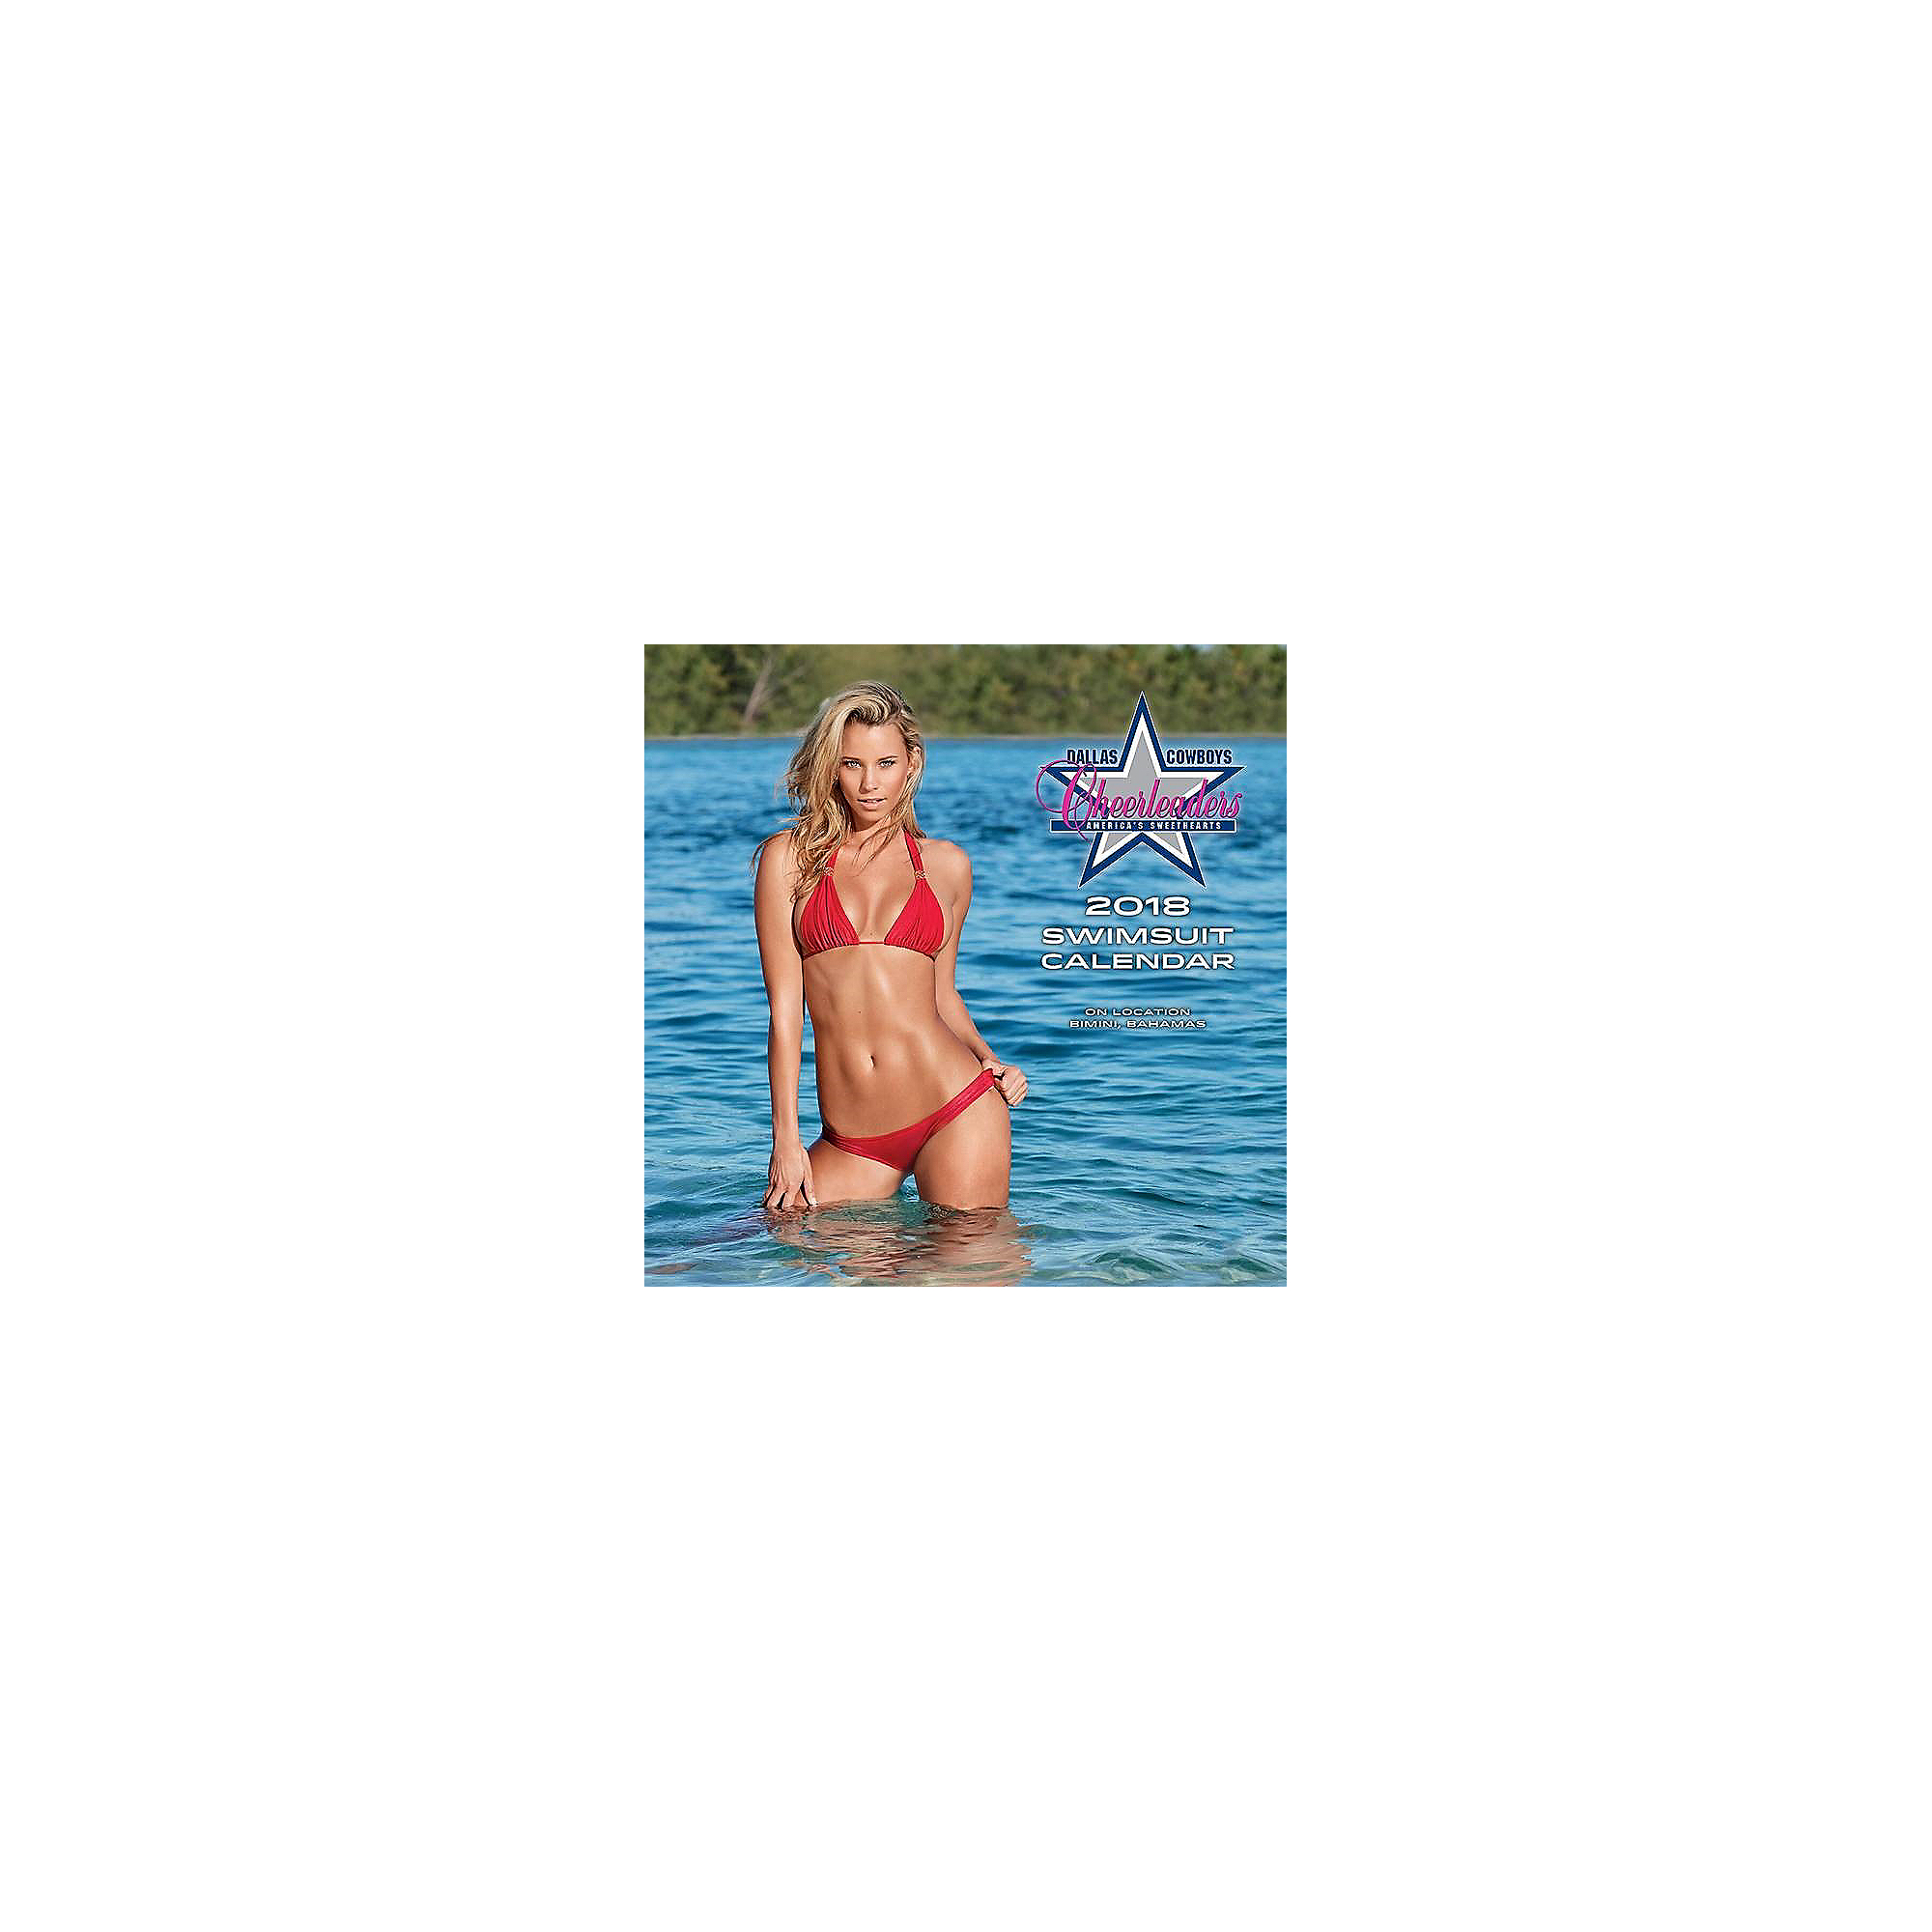 129807112c 2018 15x15 Dallas Cowboys Cheerleaders Swimsuit Wall Calendar ...